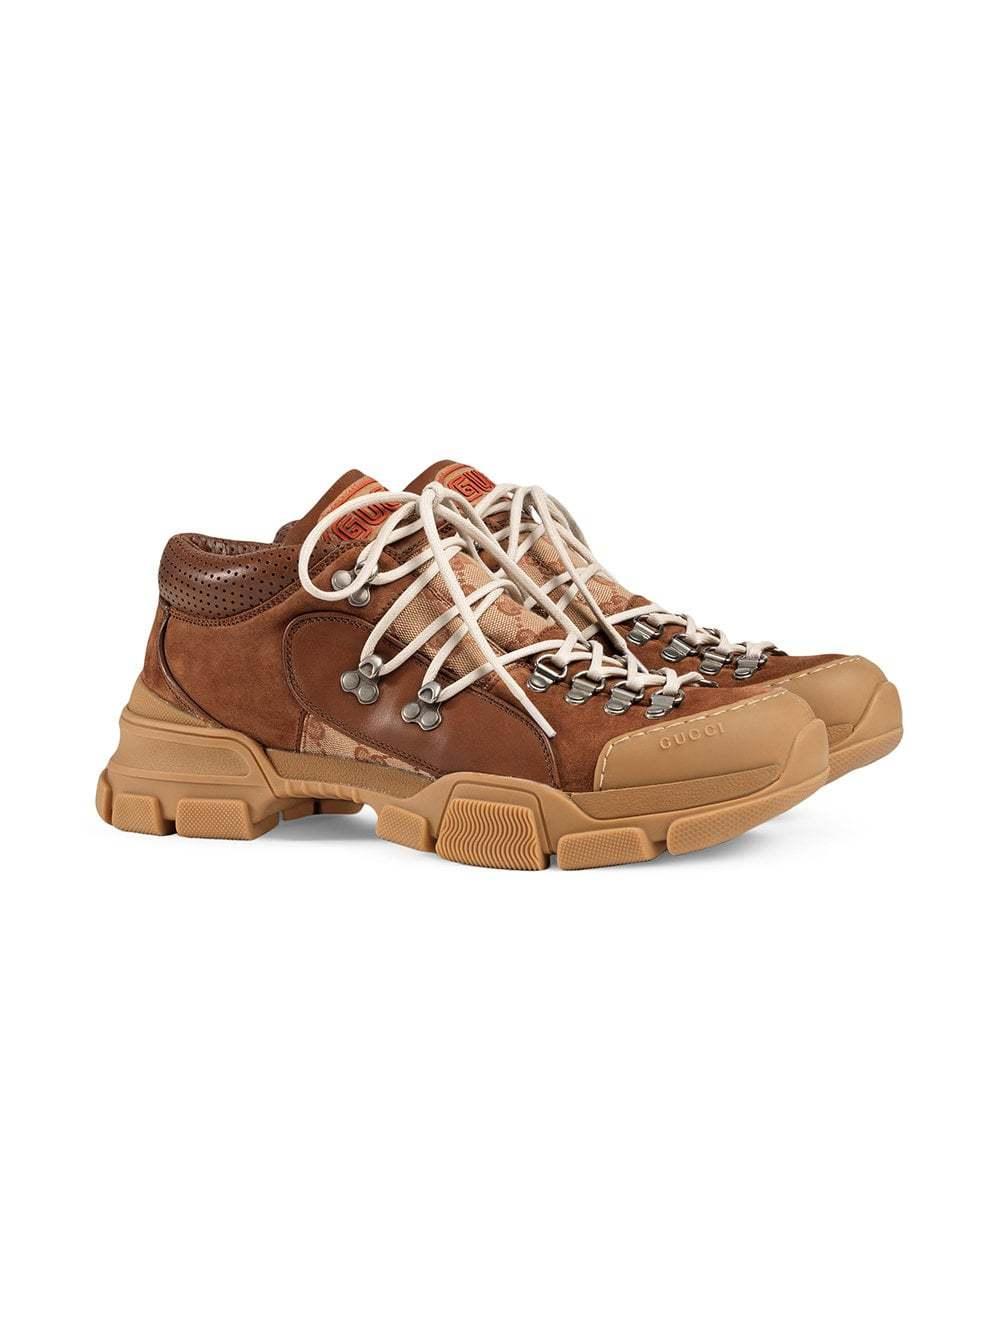 ba368f39d Gucci Leather And Original Gg Low Top Trekking Boot, $886 | farfetch.com |  Lookastic.com